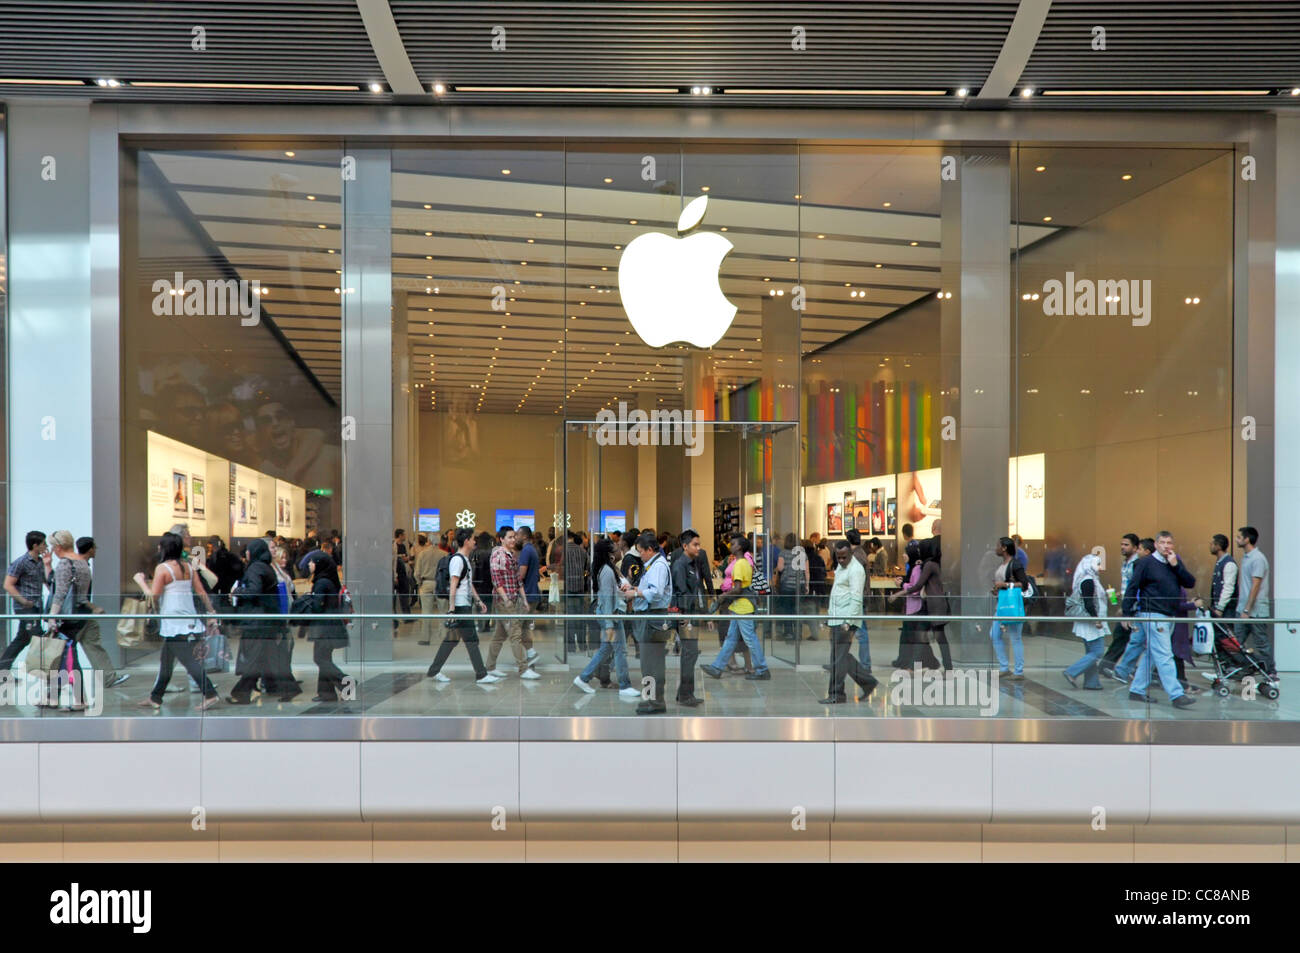 Apple Store Uk Stock Photos & Apple Store Uk Stock Images - Alamy